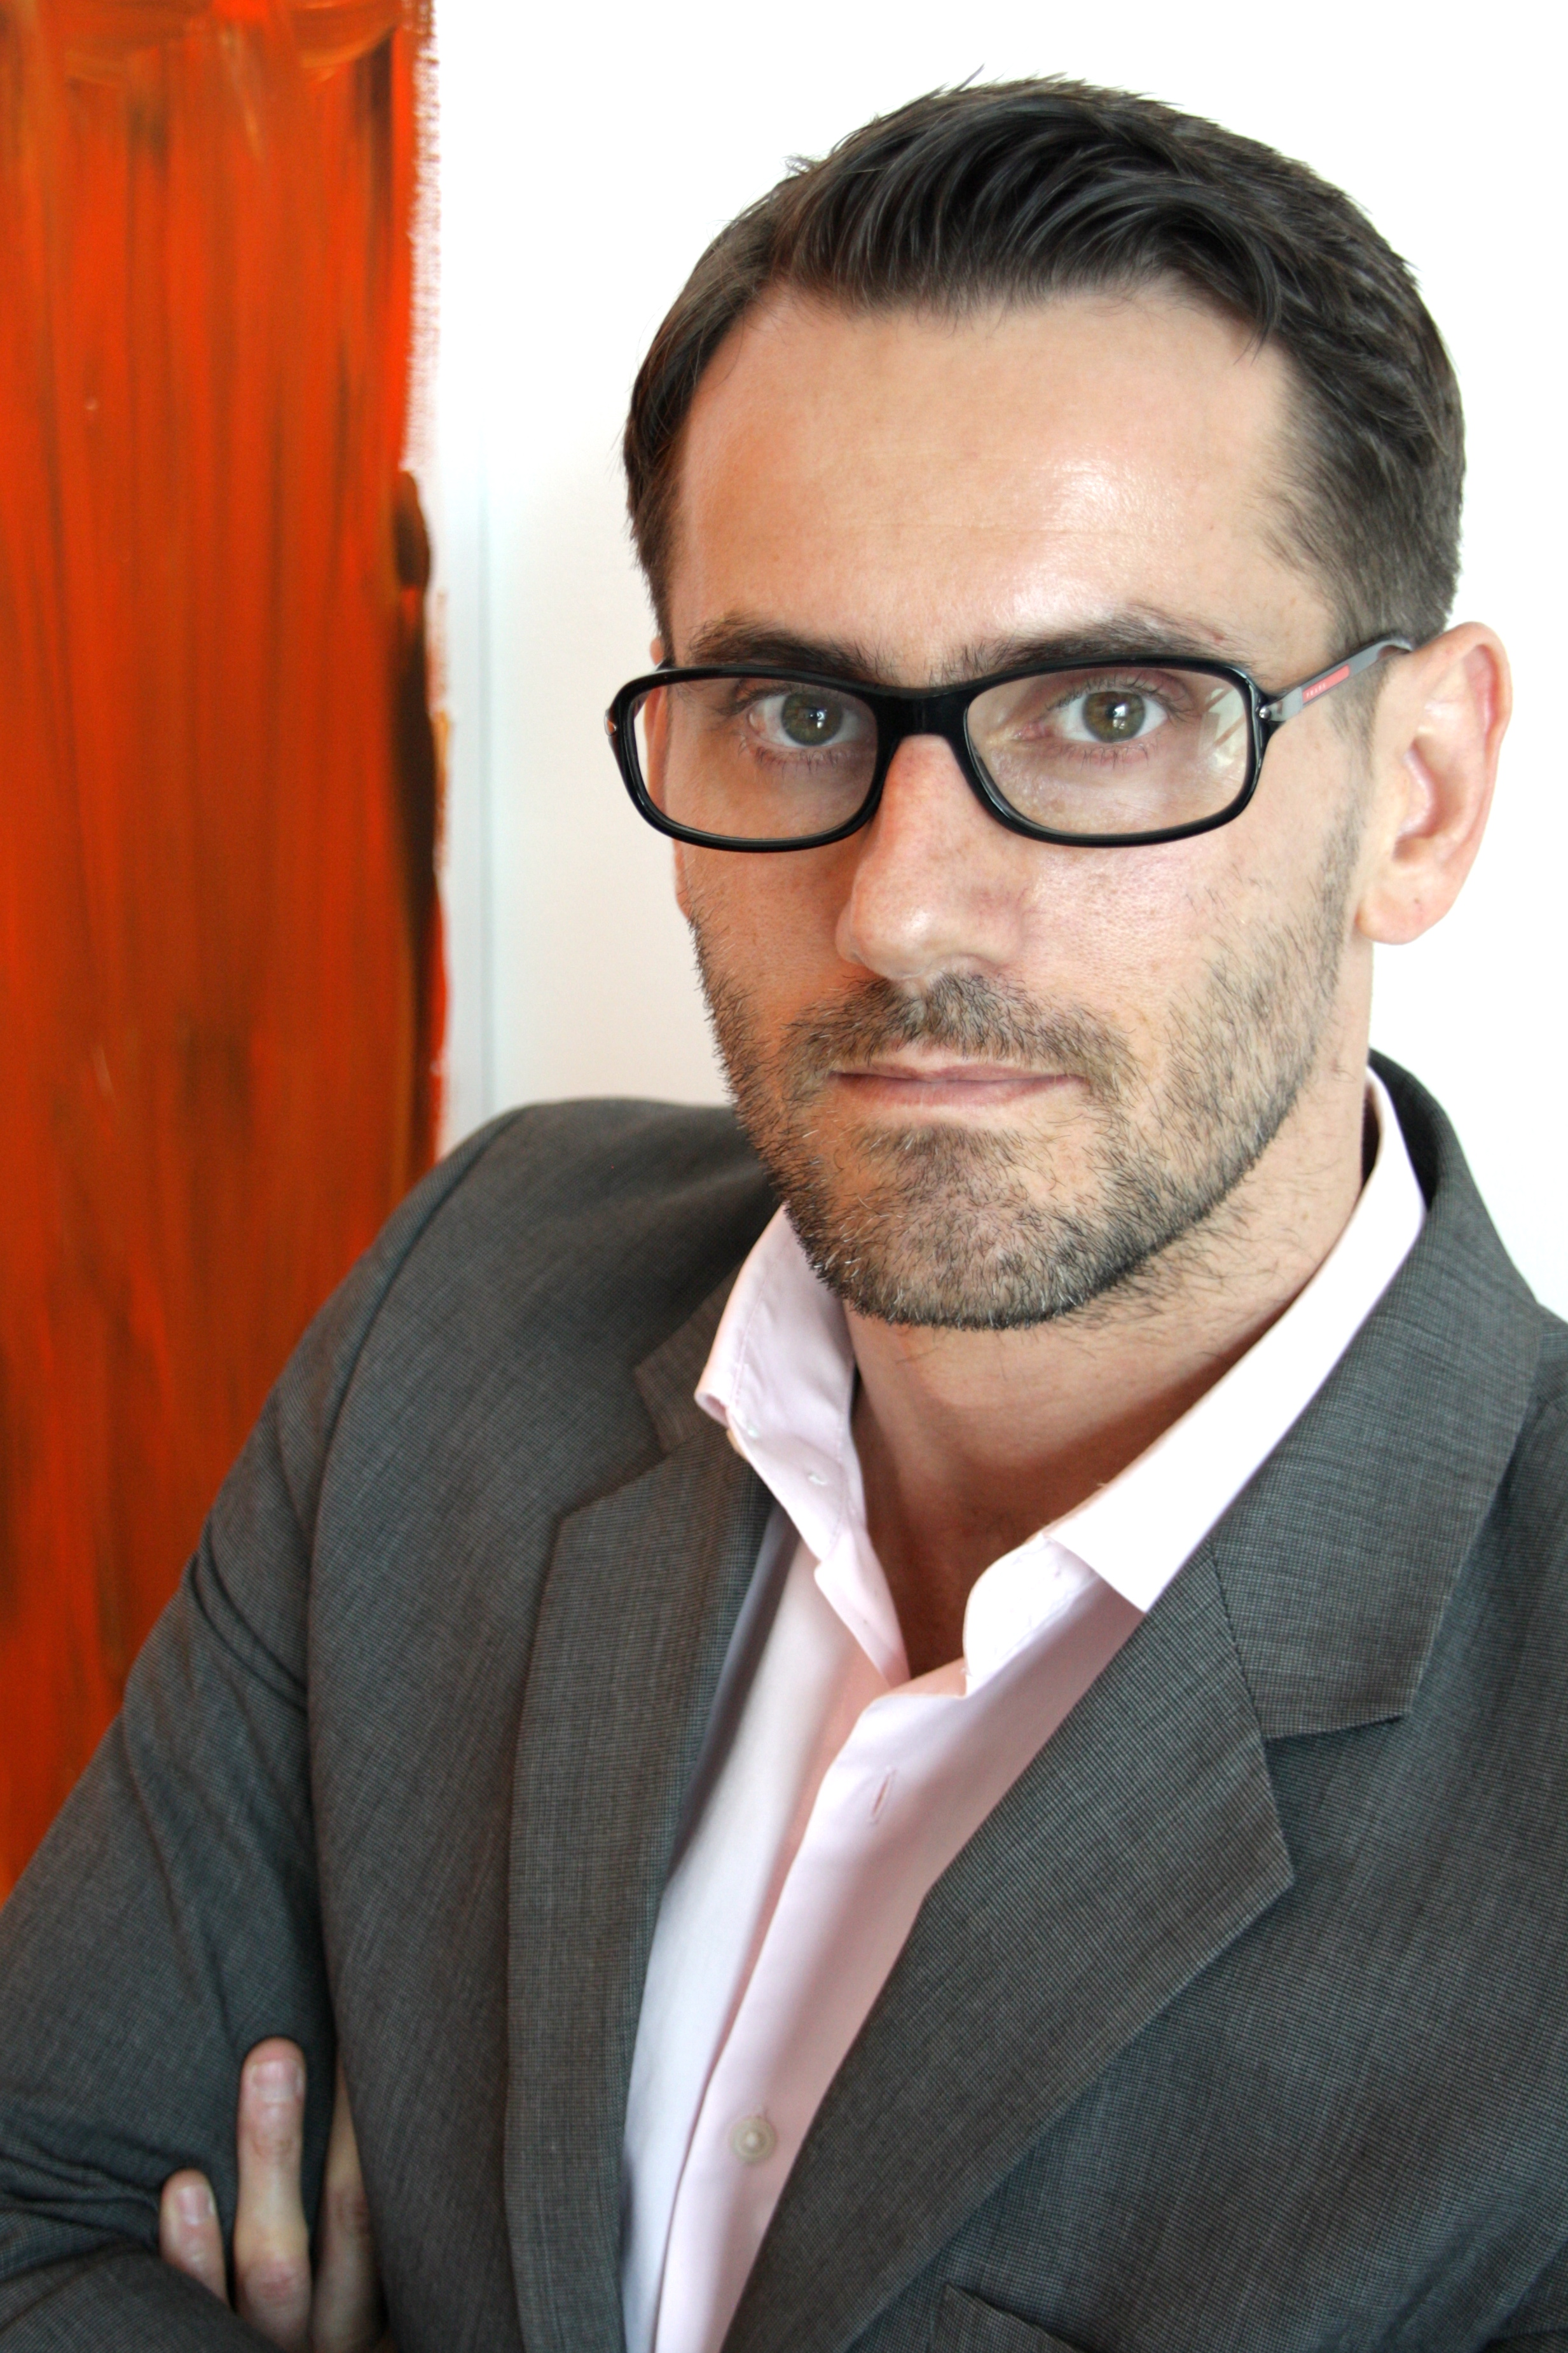 adzouk-launches-zoukontent-native-advertising-solution-in-the-region